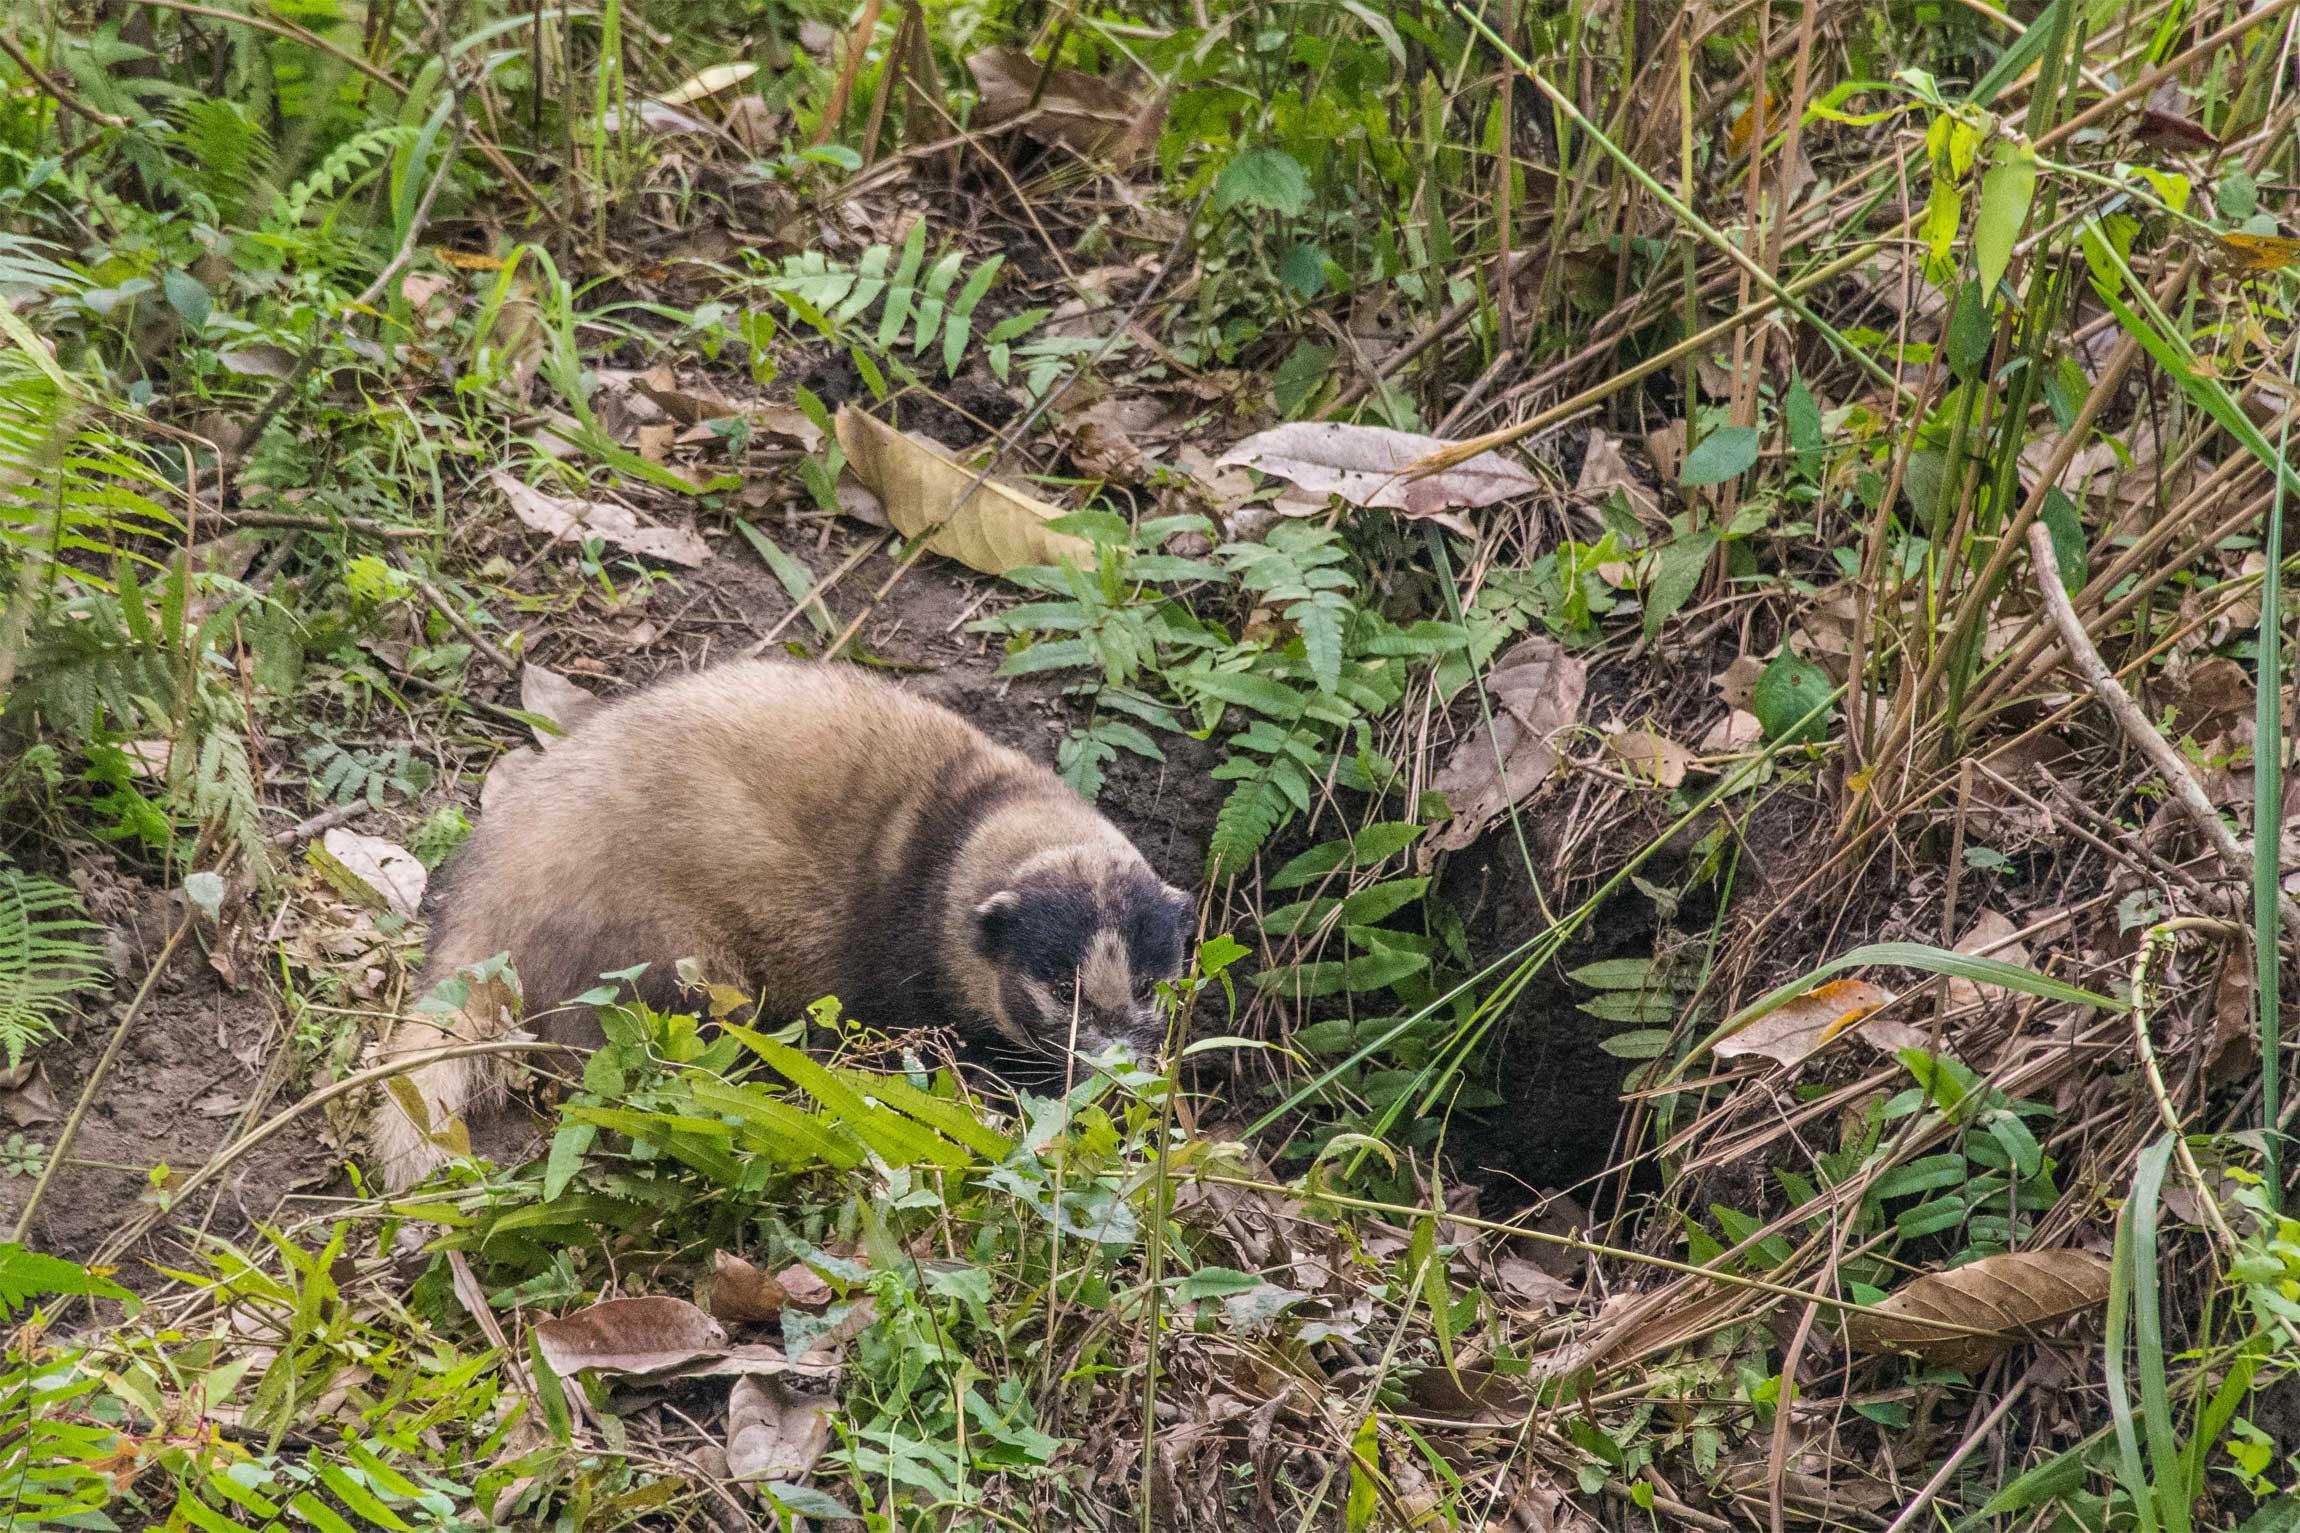 India Wildlife Tours Highlight - A Hog badger